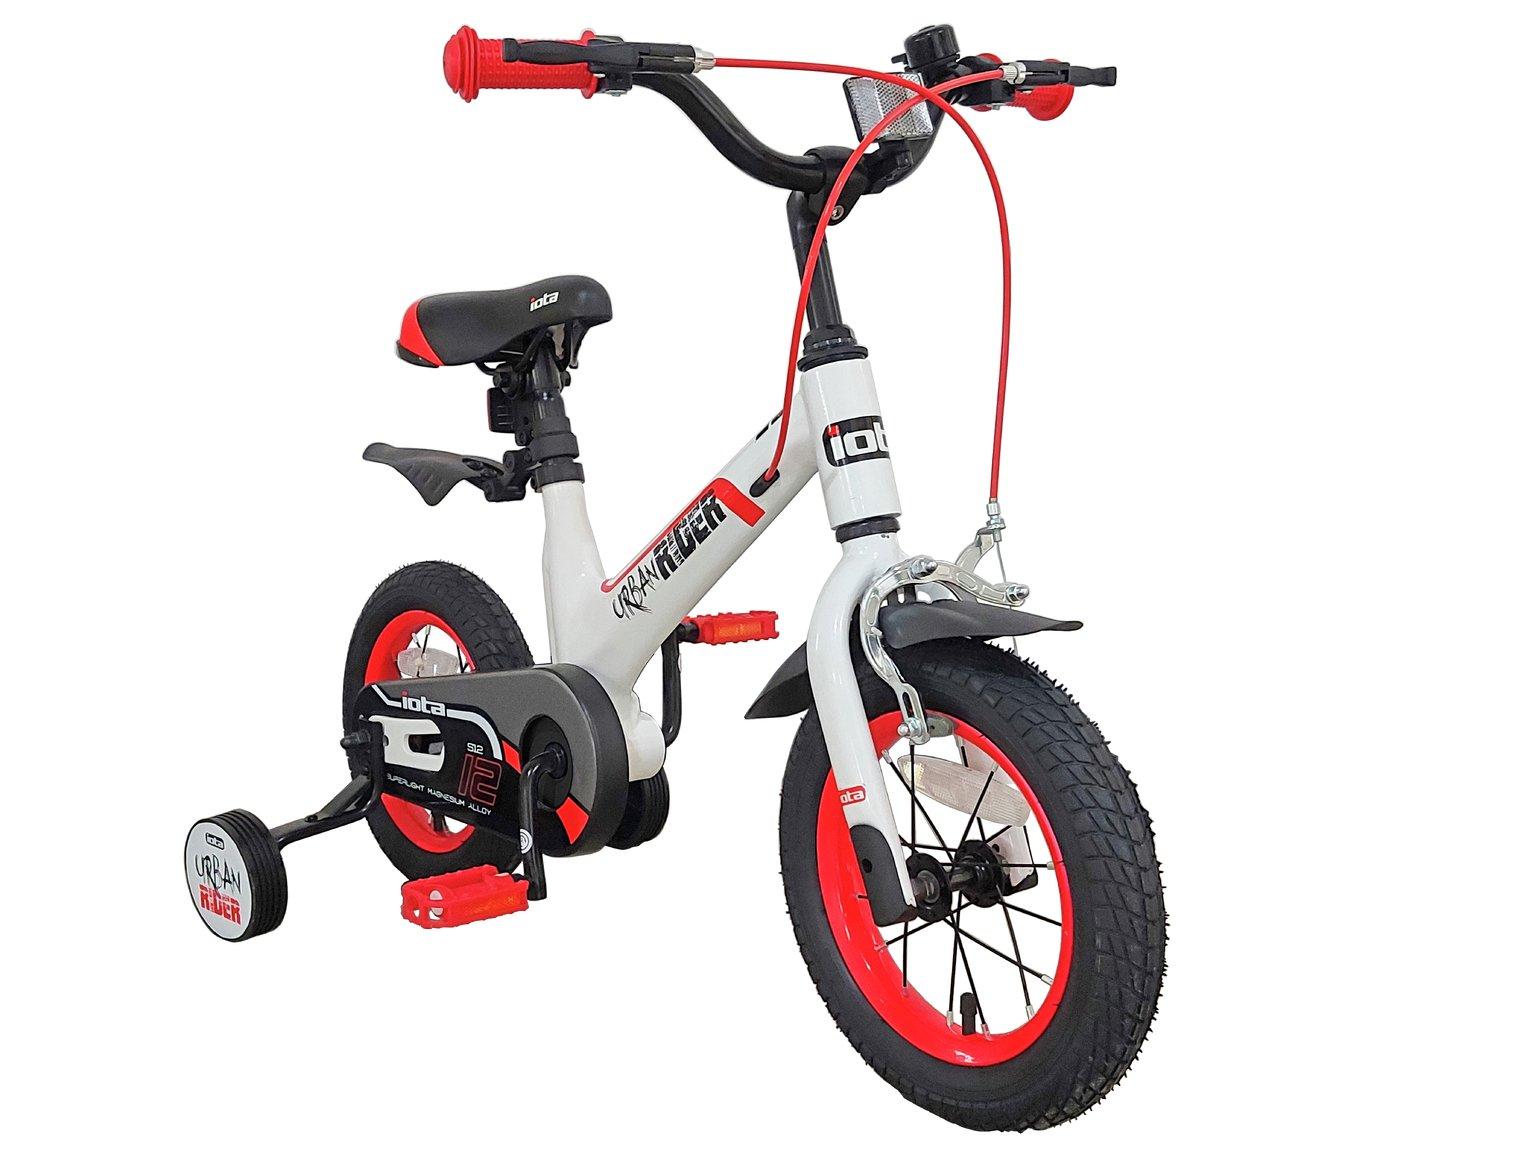 Iota Urban Rider 12 inch Wheel Size Alloy Kid's Bike